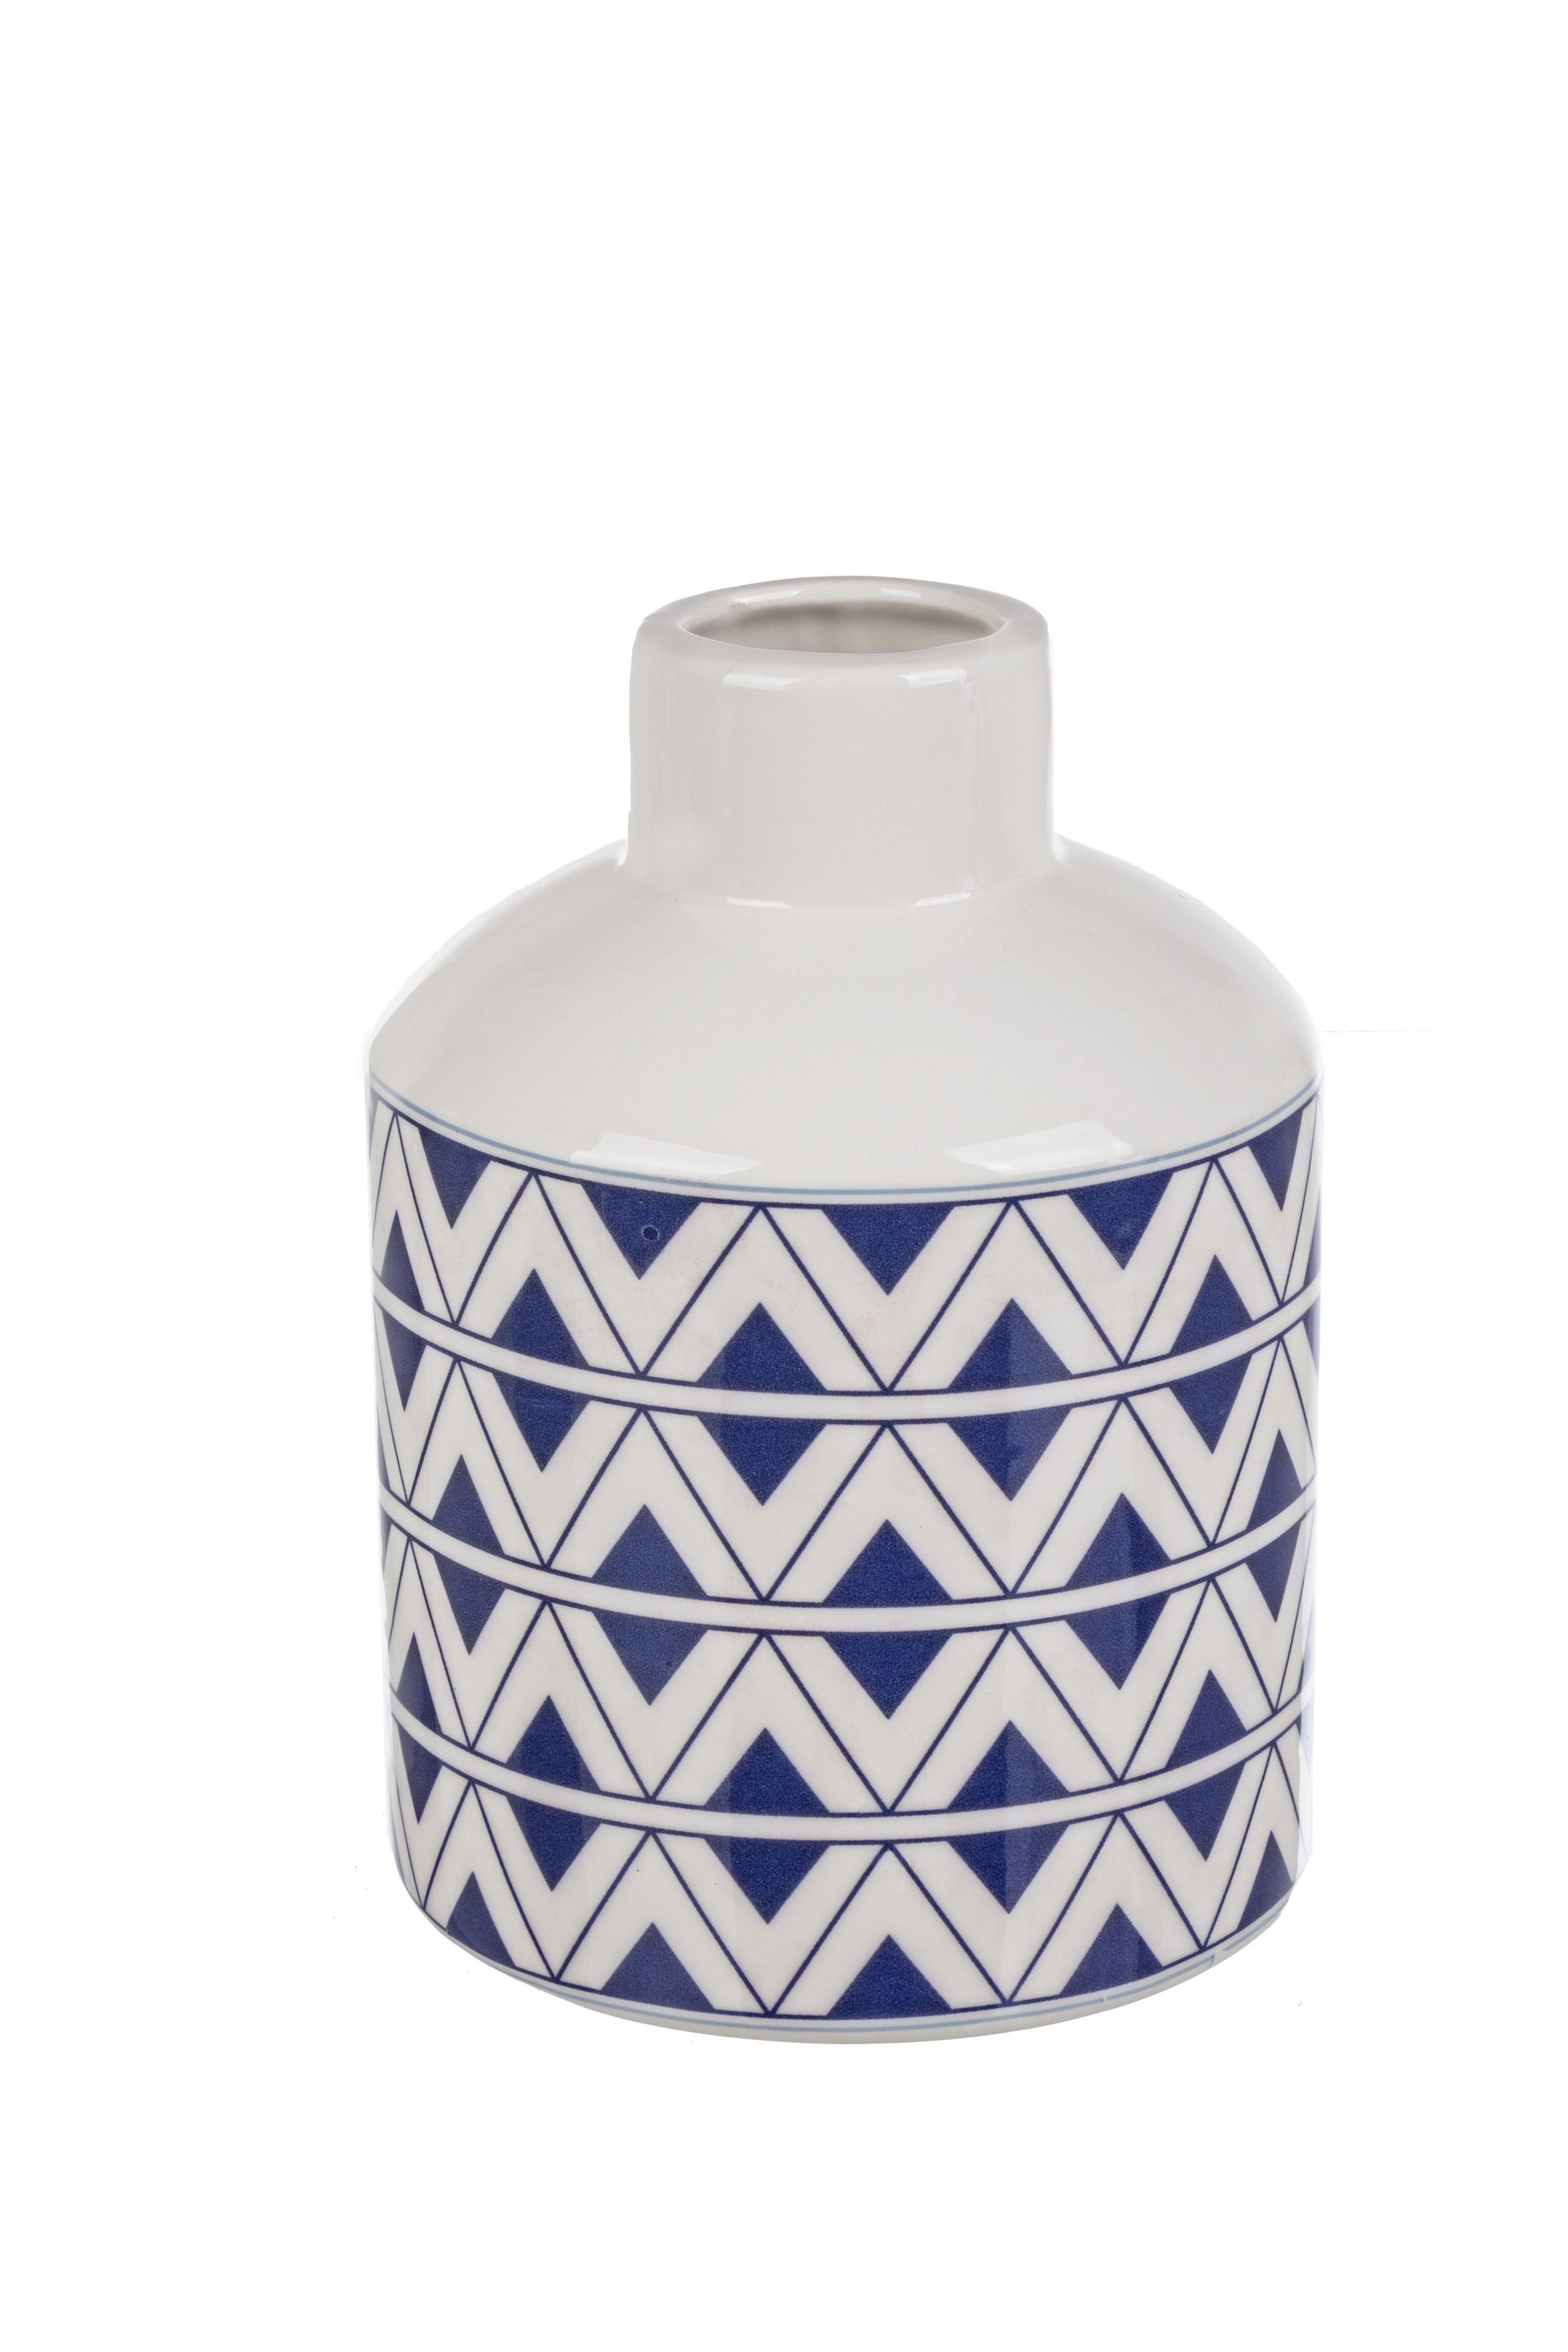 Vaza decorativa din ceramica Tunisi L Alb / Albastru, Ø15,8xH21,5 cm